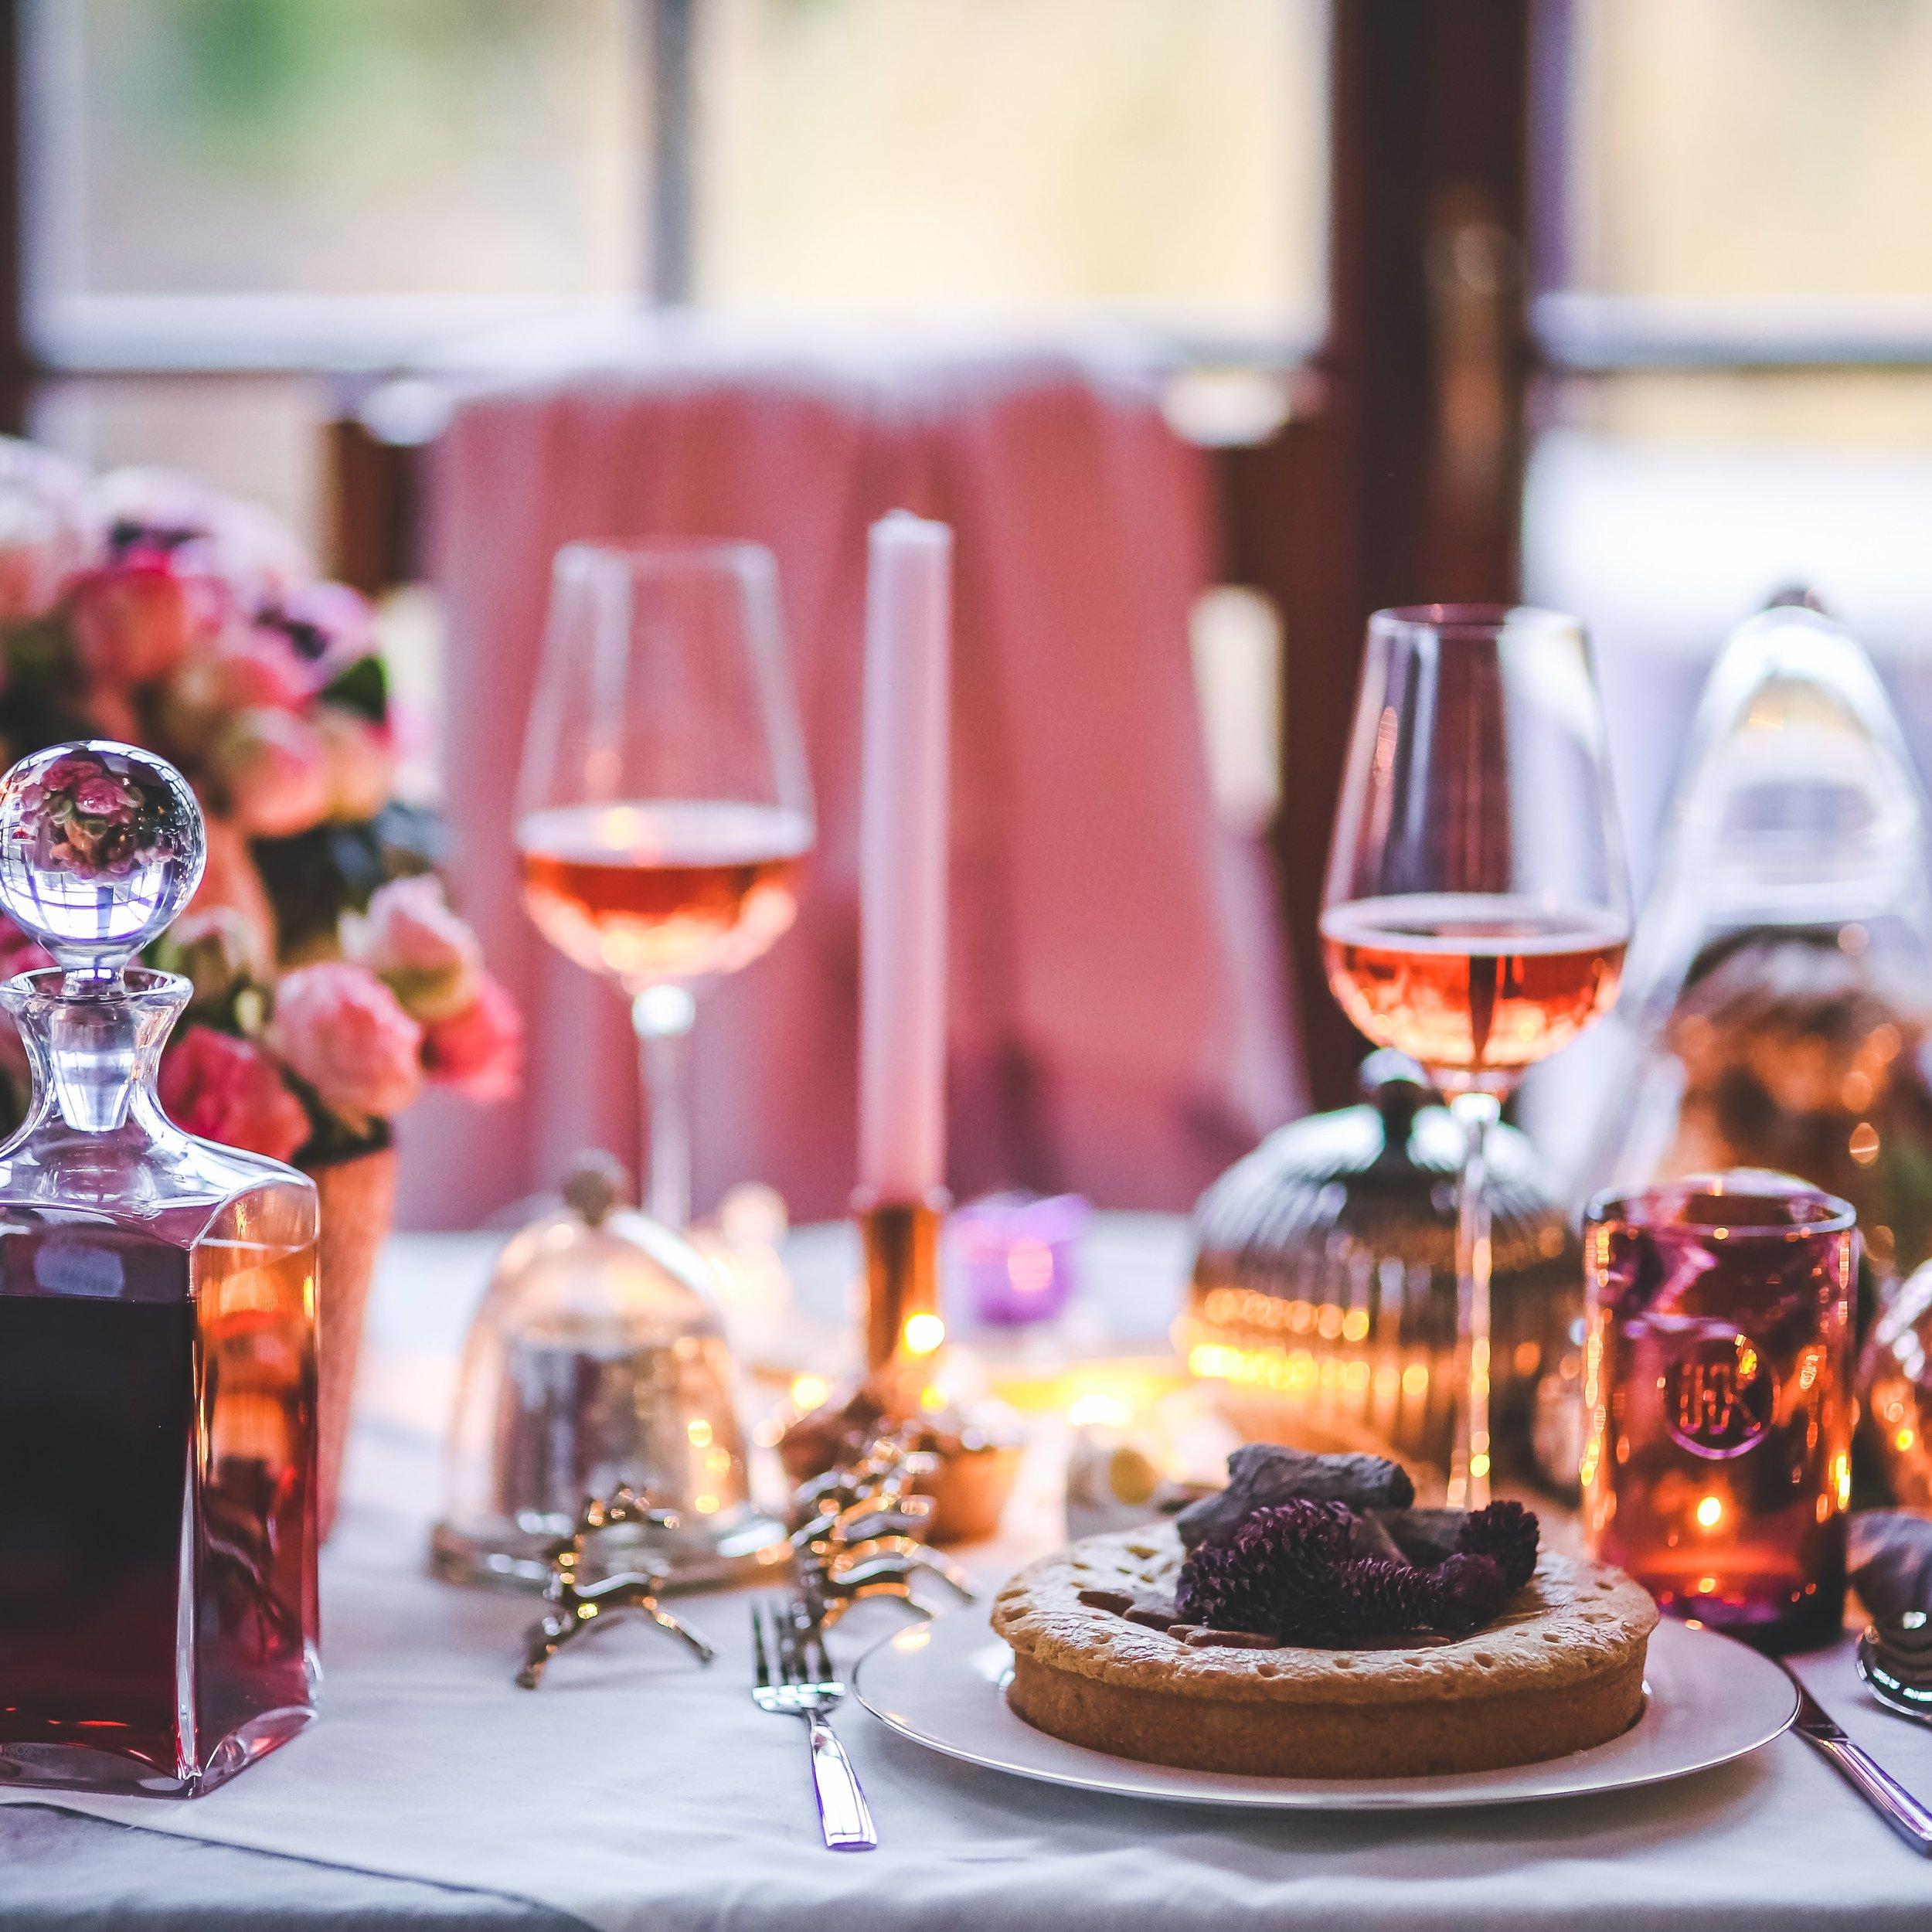 dinner-meal-table-wine square.jpg